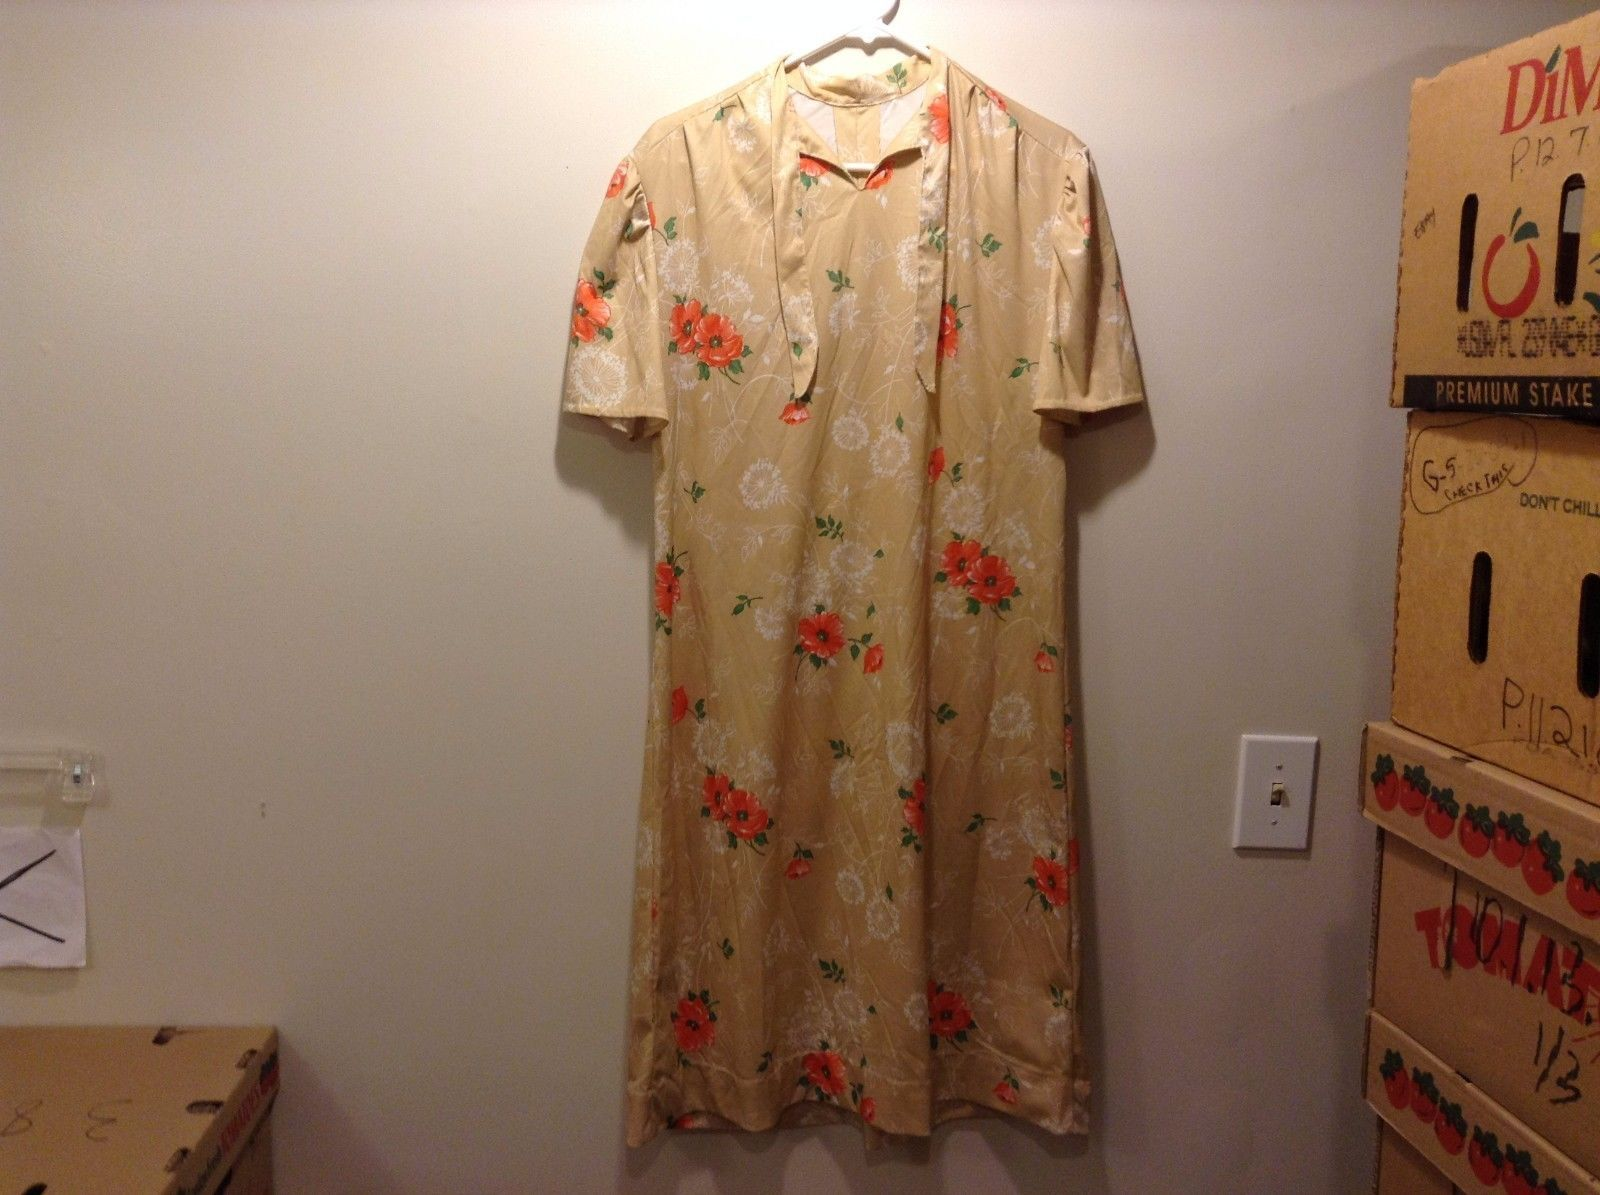 Beige Handmade Floral Print Dress